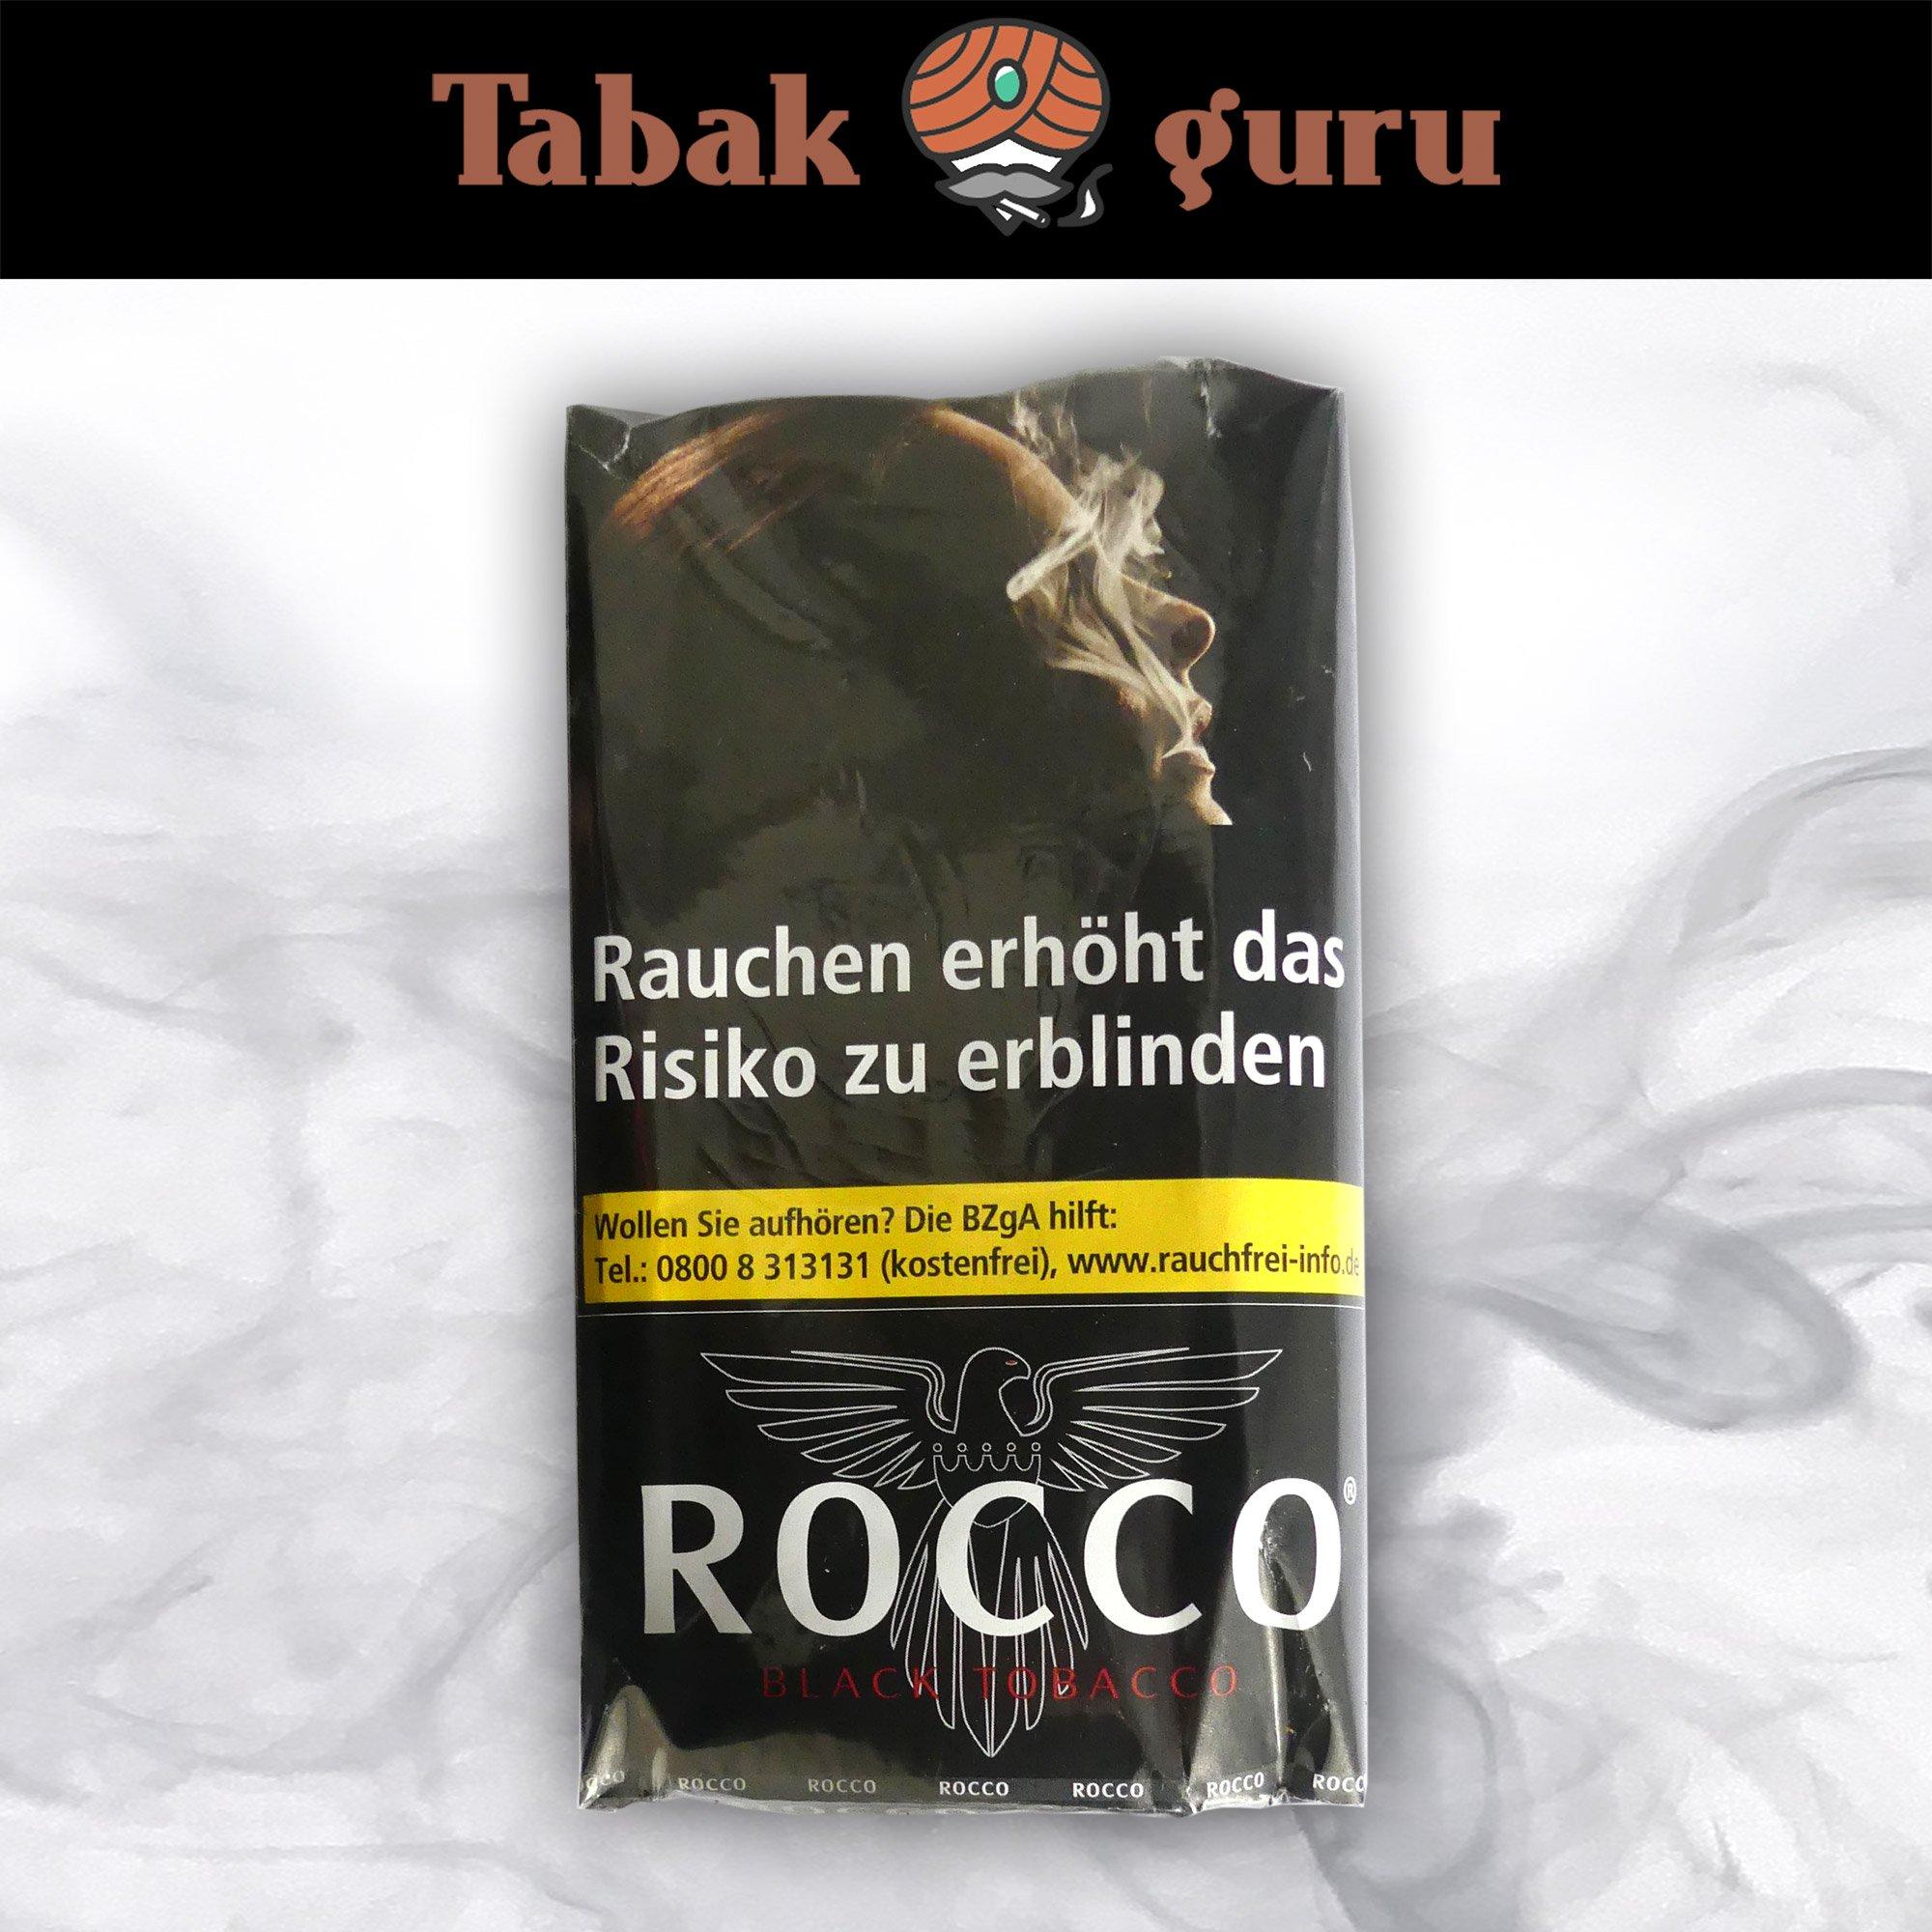 ROCCO Black Tobacco Drehtabak 38 g